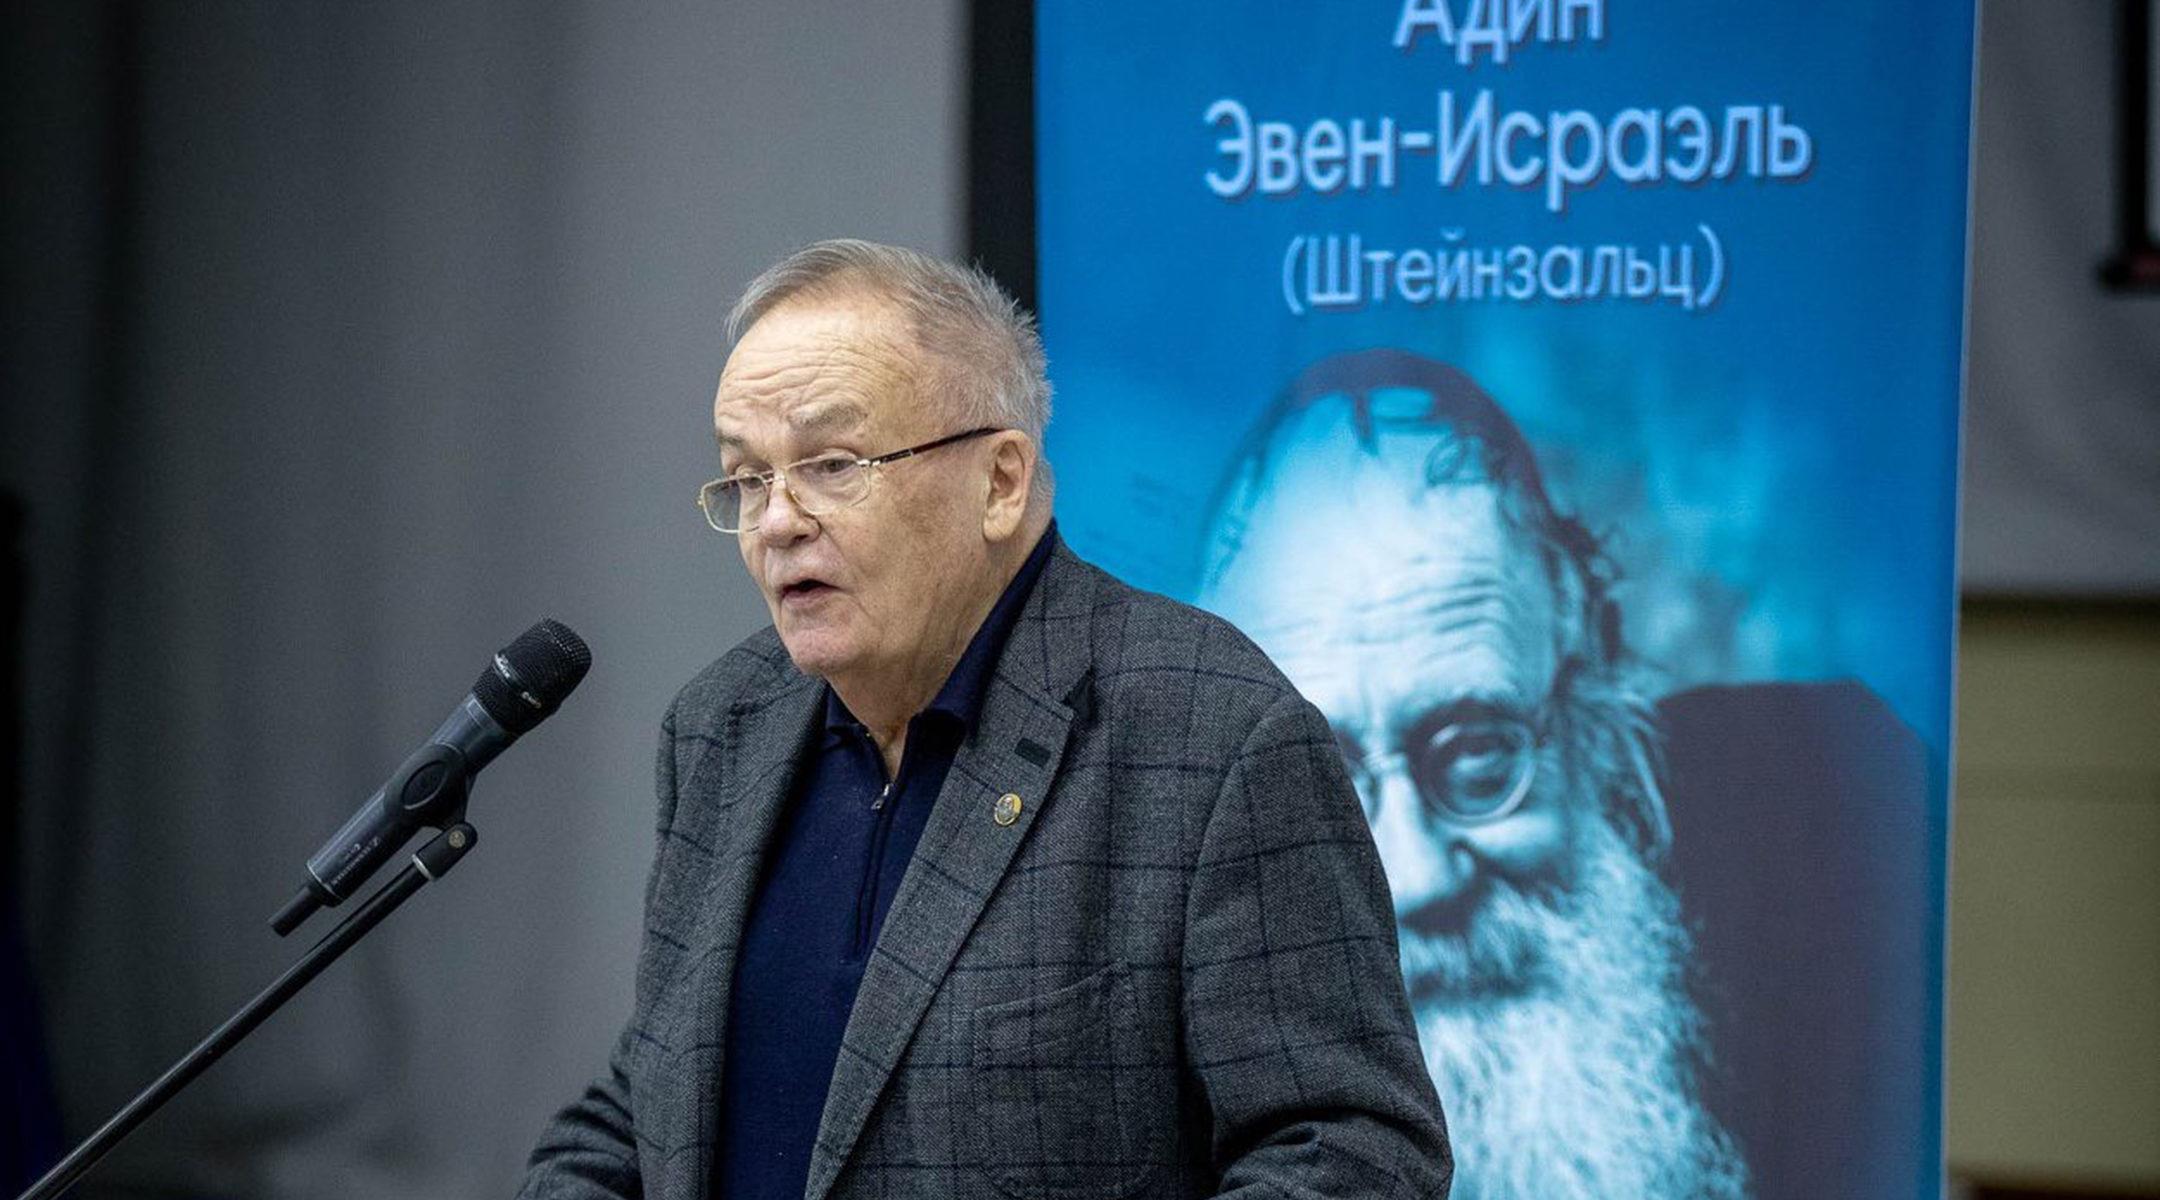 Evgeny Velikhov speaking at Limmud FSU Moscow on April 12, 2019. (Courtesy of Limmud FSU)